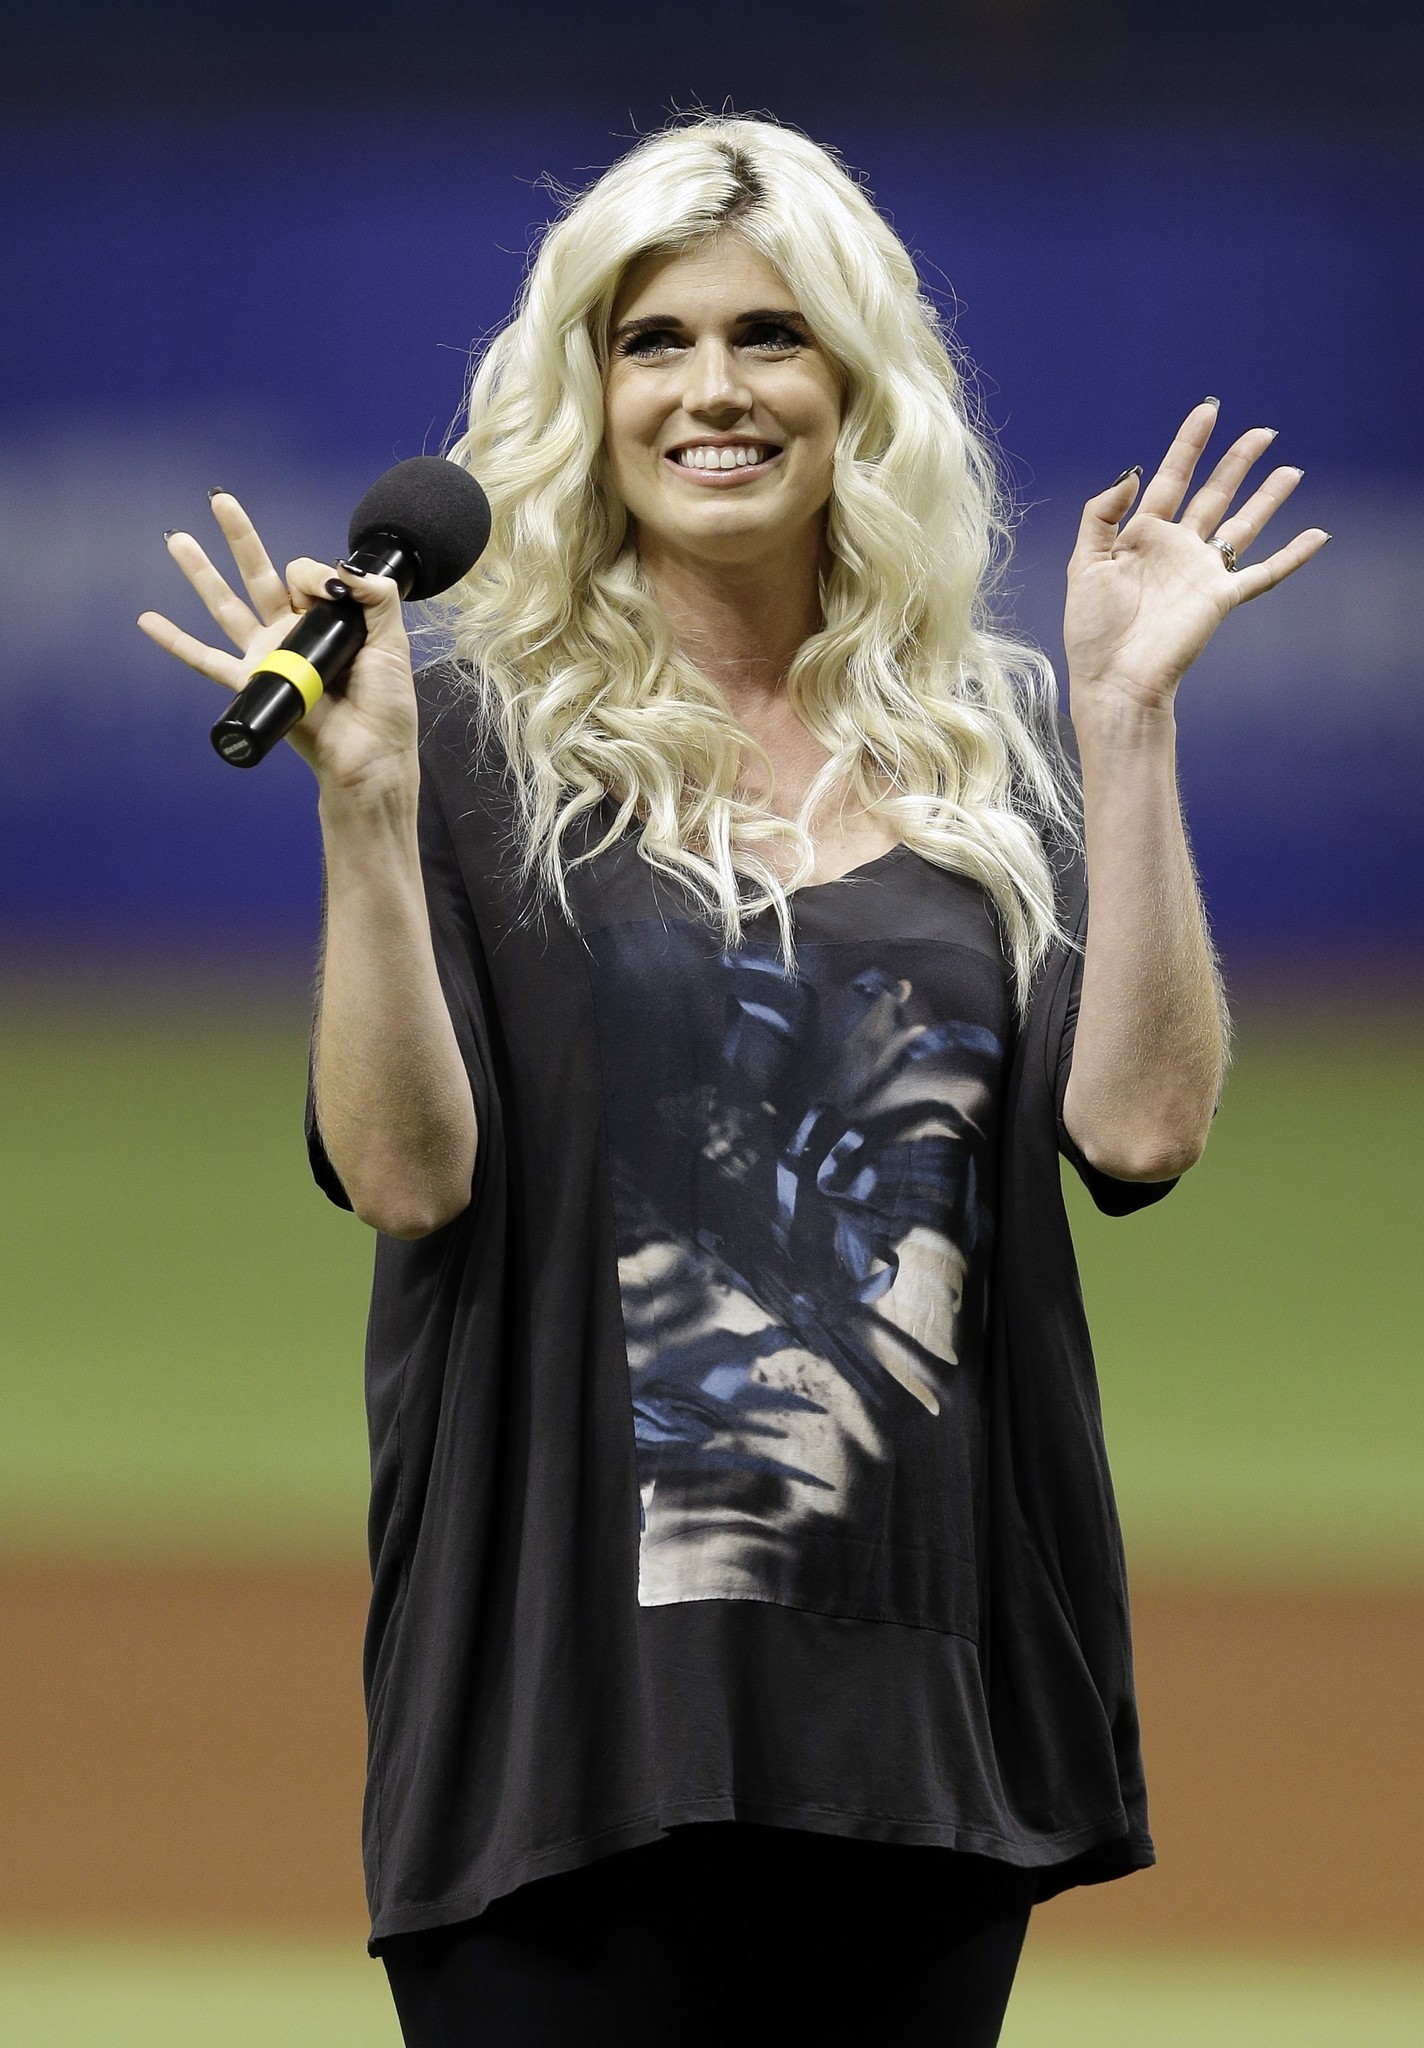 Singer Julianna Zobrist (Ben's wife) on the Cubs, walk-up ...